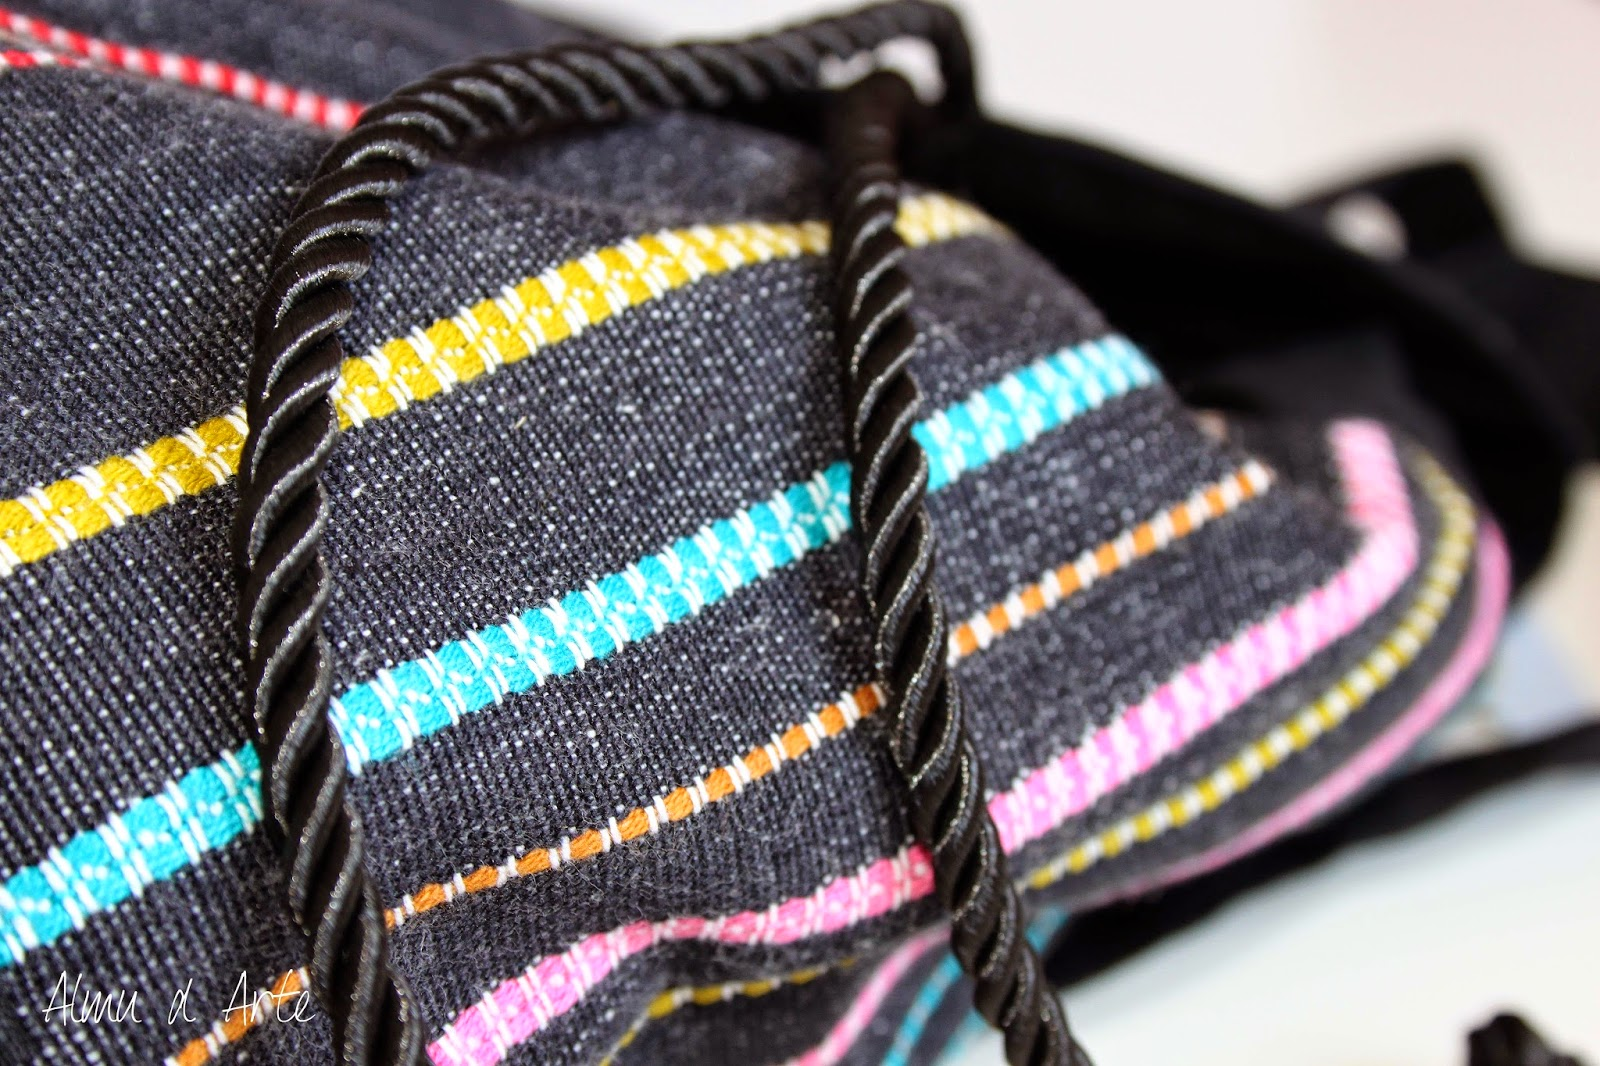 Mochila artesanal con tela étnica